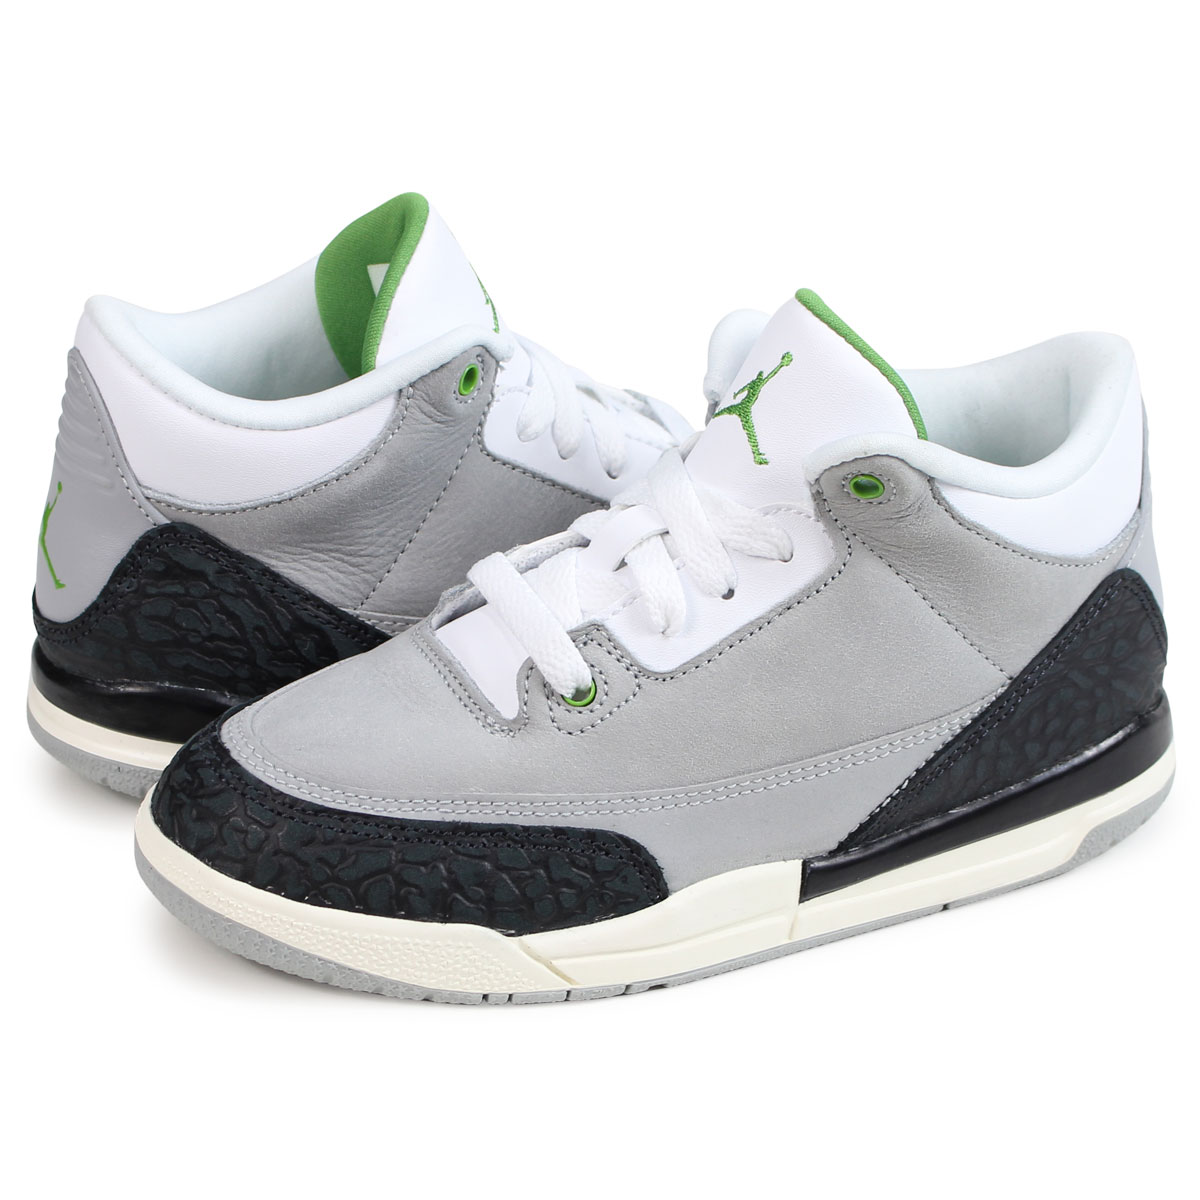 a2d3a1a548 Whats up Sports: Nike NIKE Air Jordan 3 nostalgic kids sneakers AIR ...